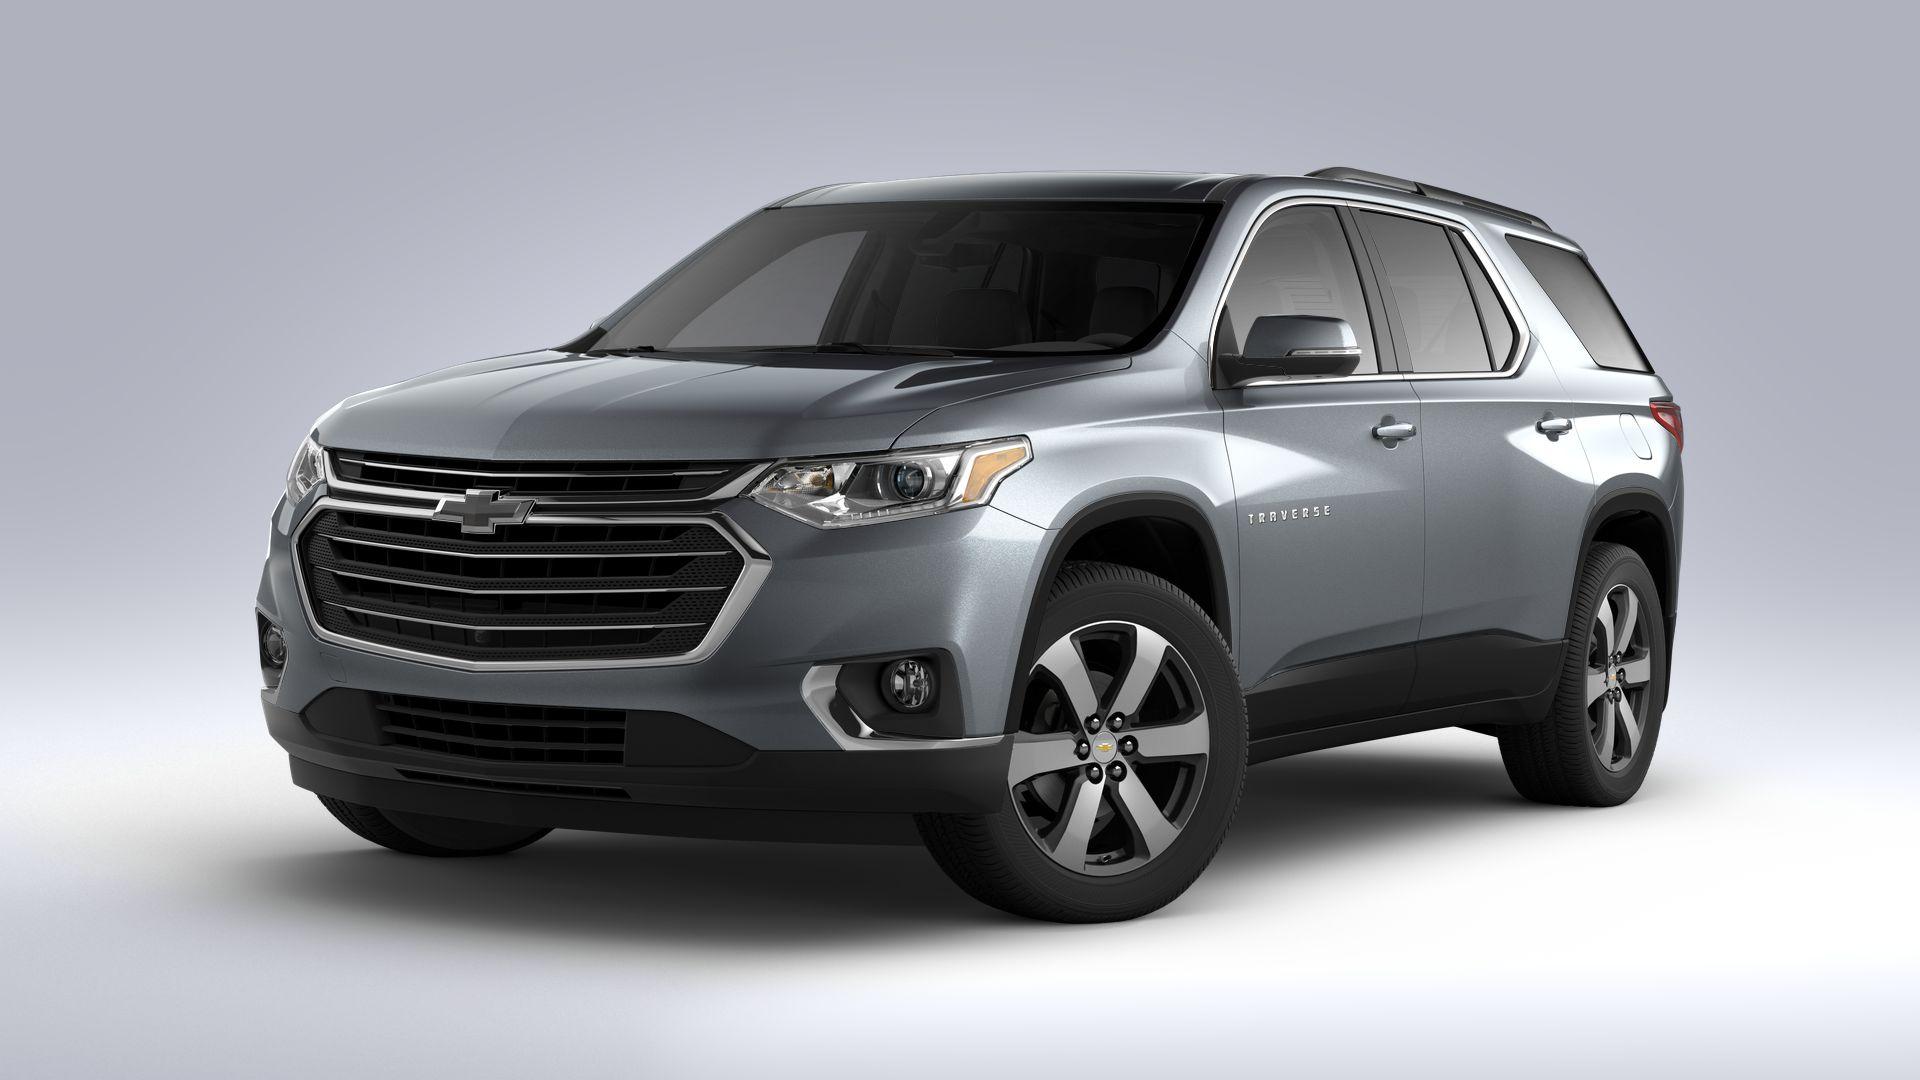 New 2021 Chevrolet Traverse For Sale At Bonner Chevrolet Vin 1gnevhkw0mj111534